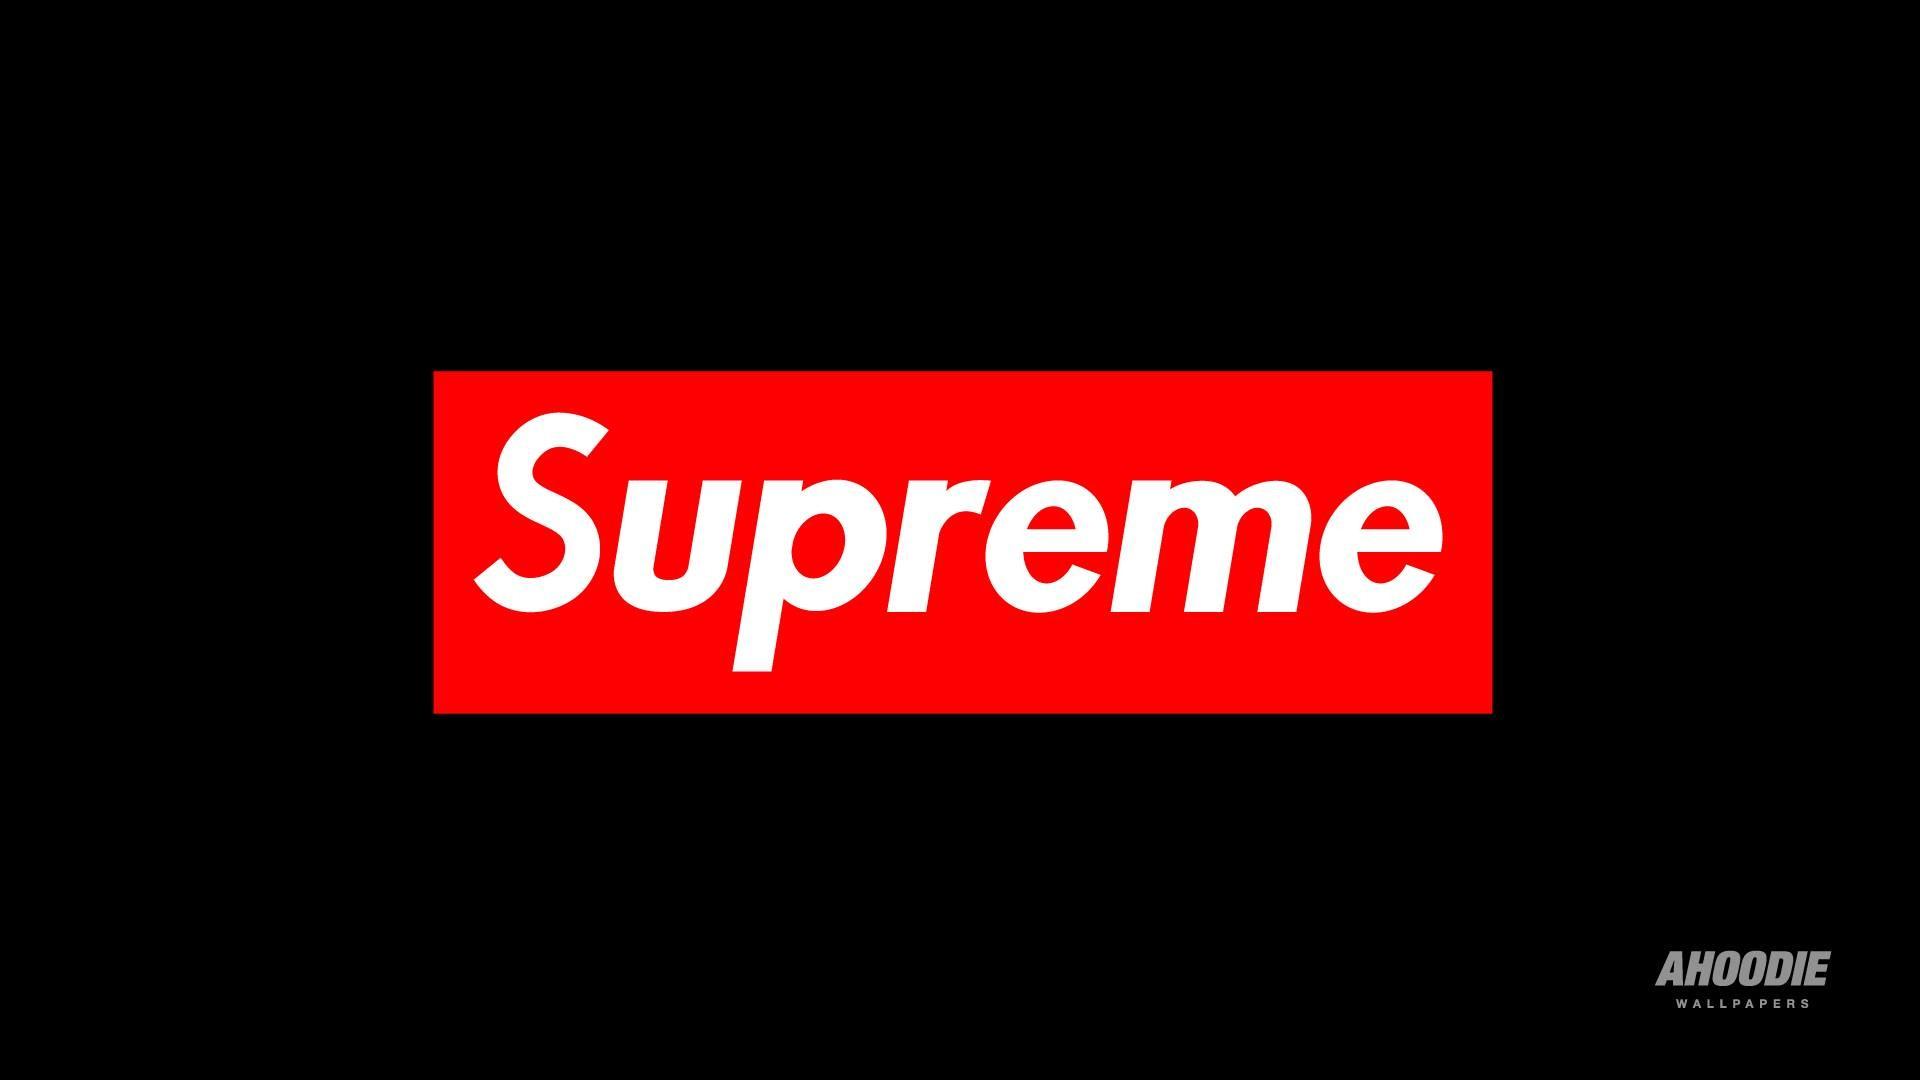 Supreme Wallpaper For Desktop Supreme Wallpaper Hd Iphone